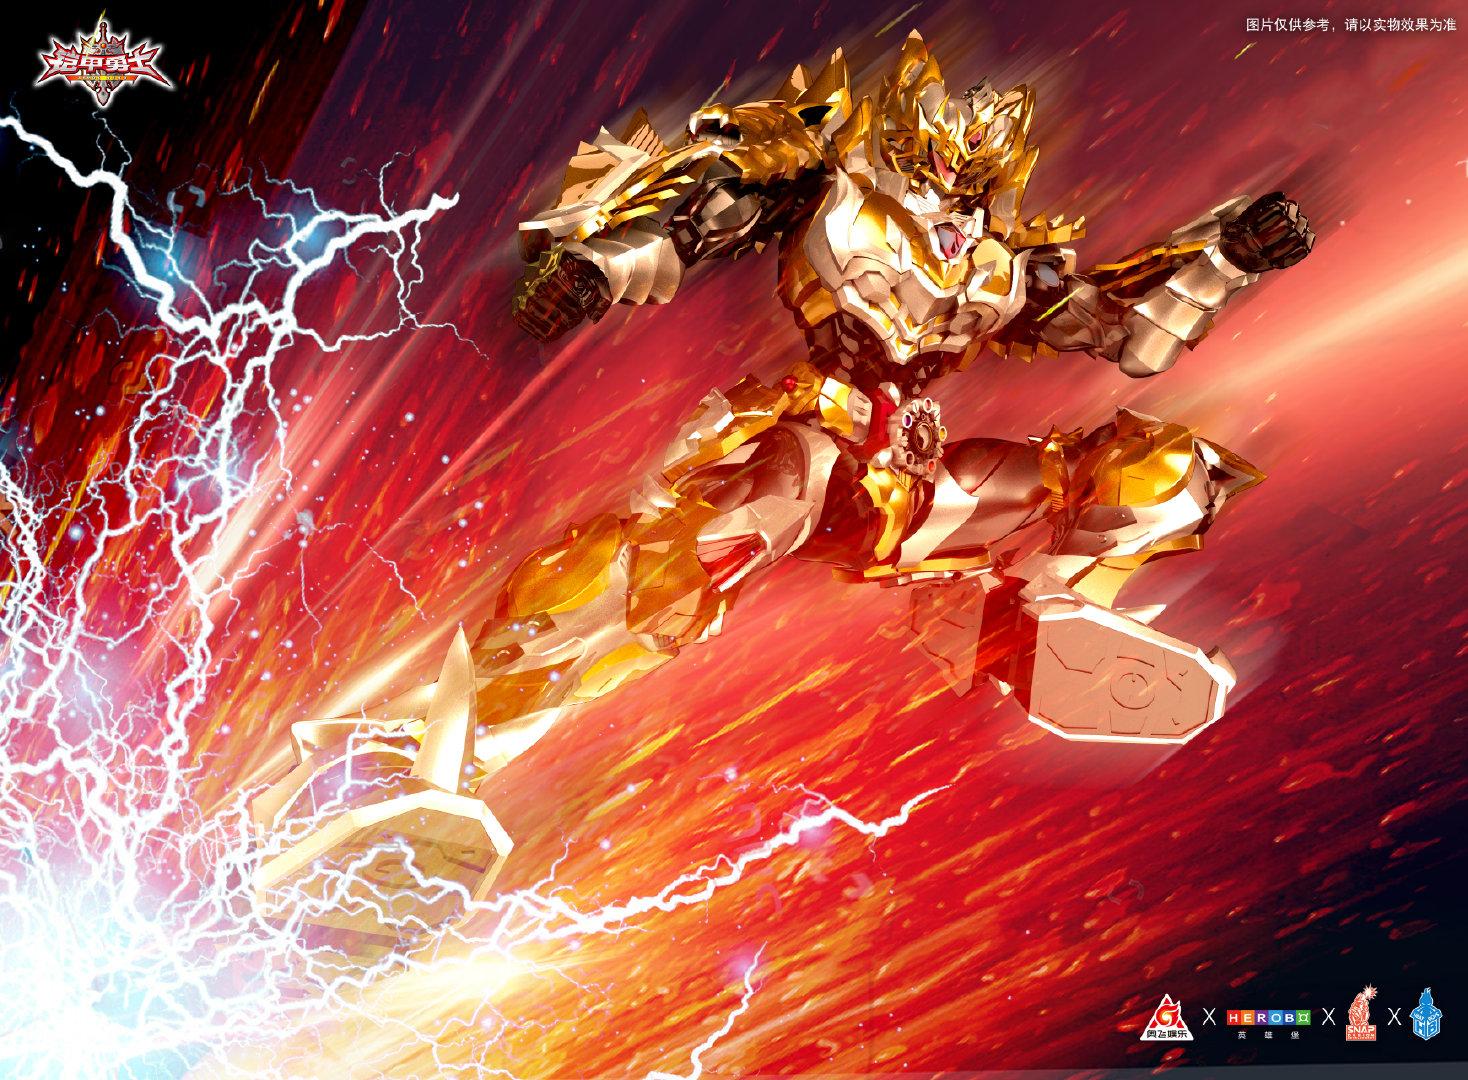 S535_Armor_hero_Emperor_029.jpg